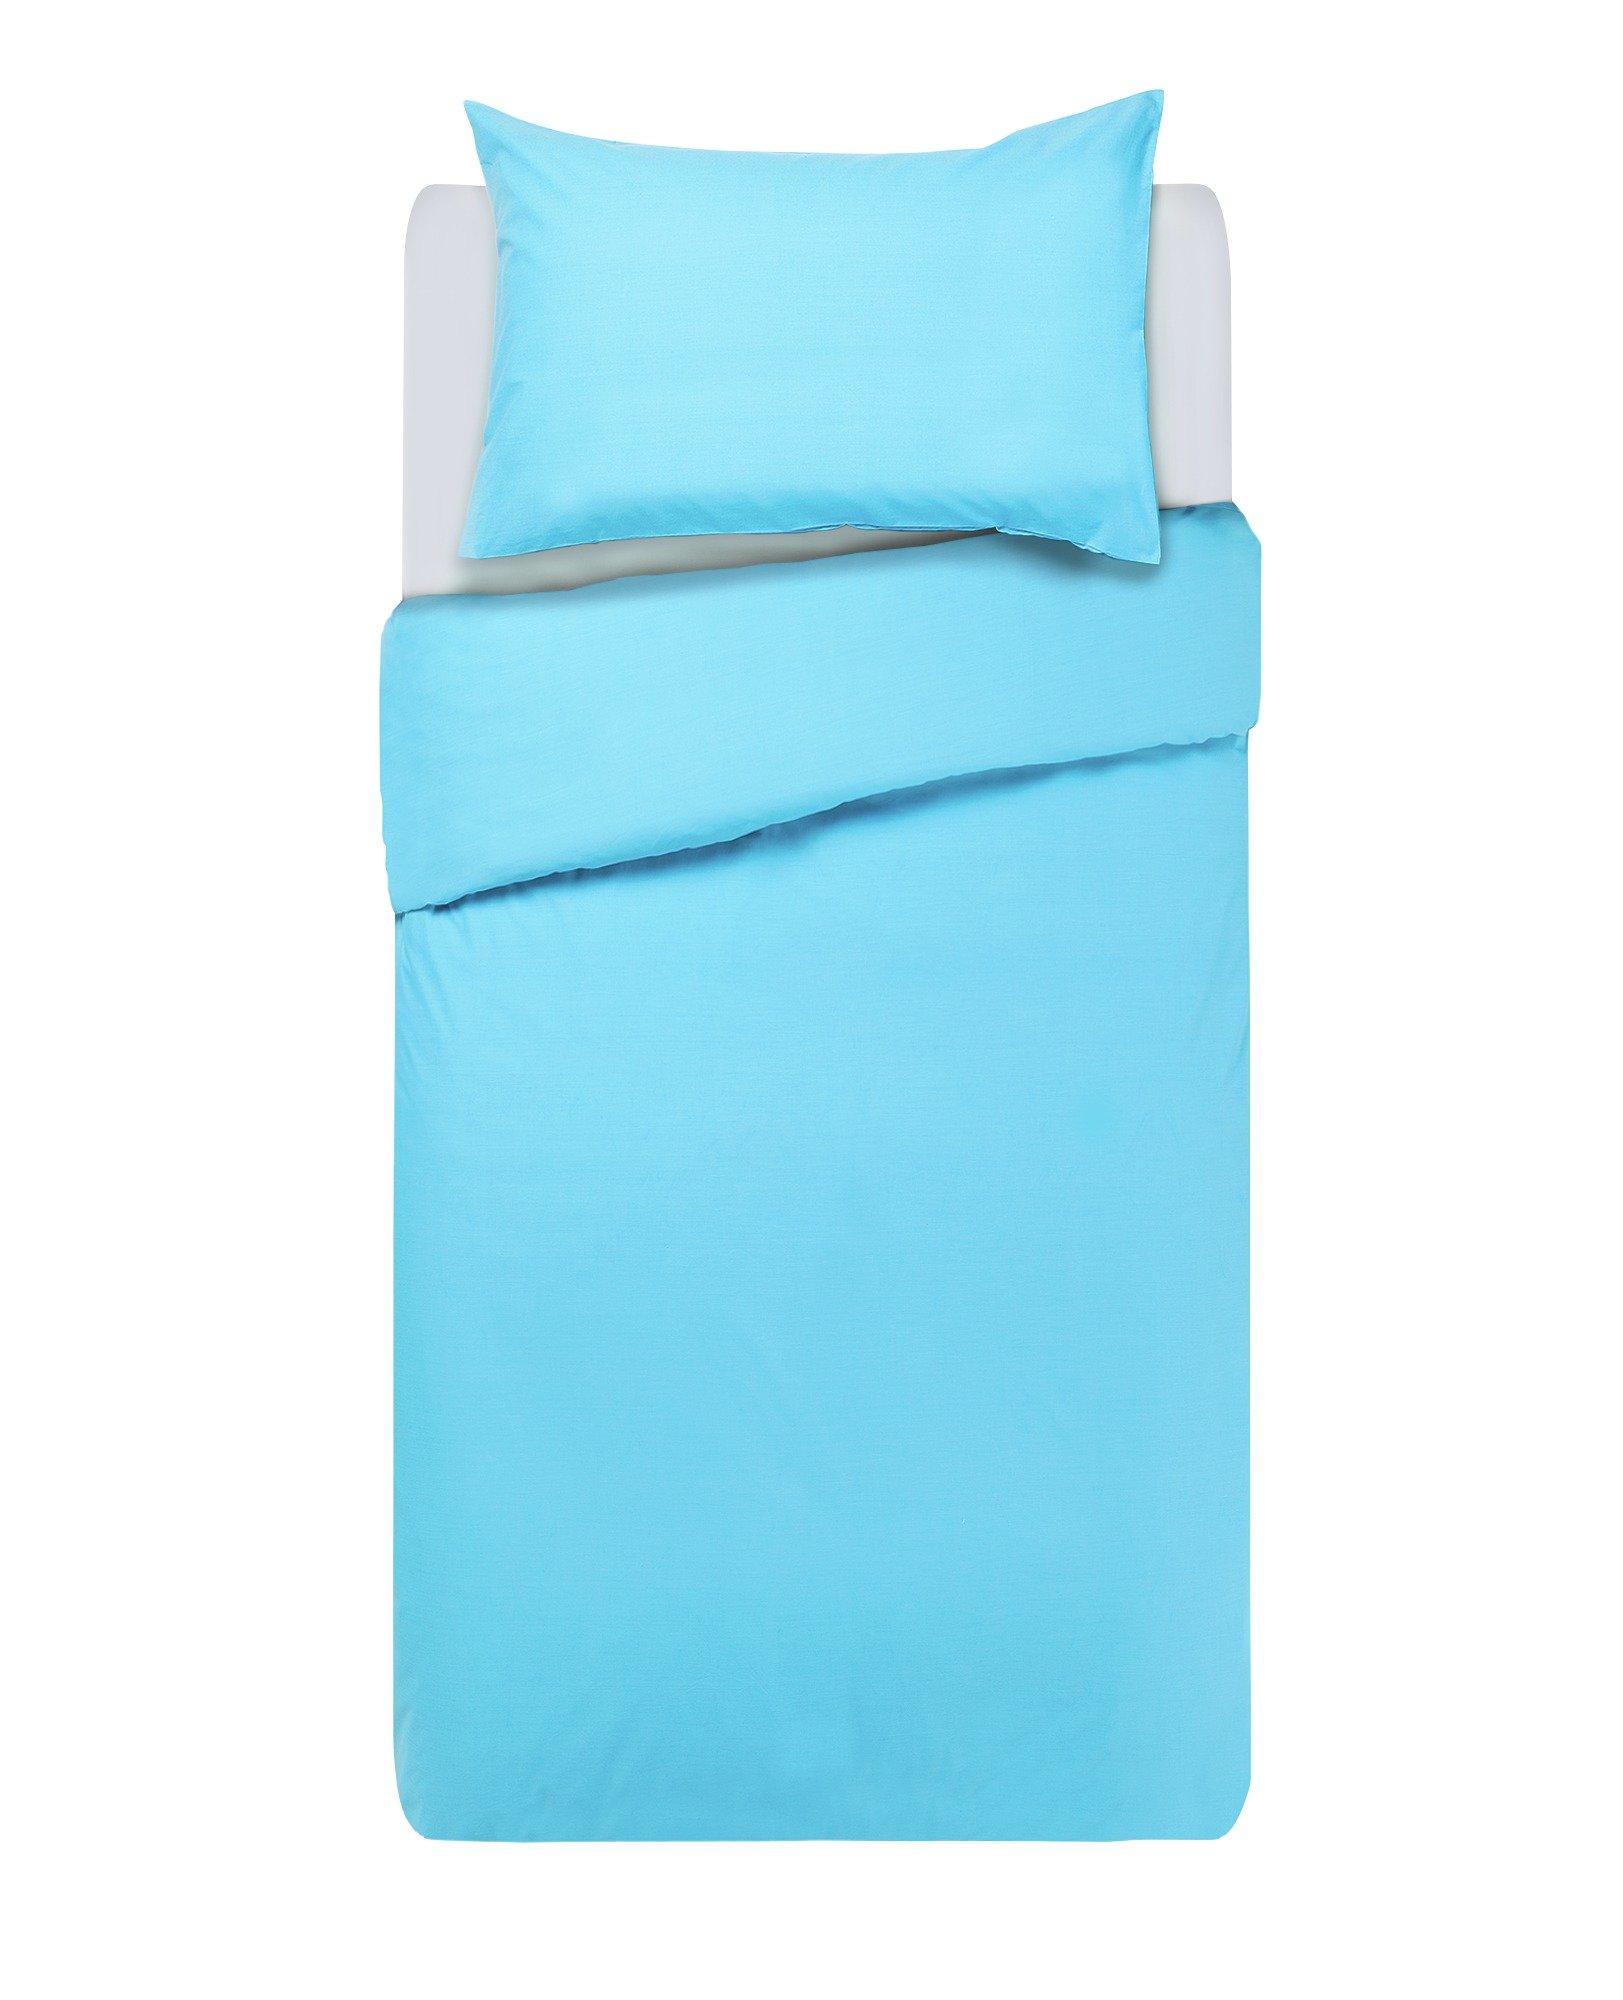 ColourMatch Crystal Blue Bedding Set - Single.